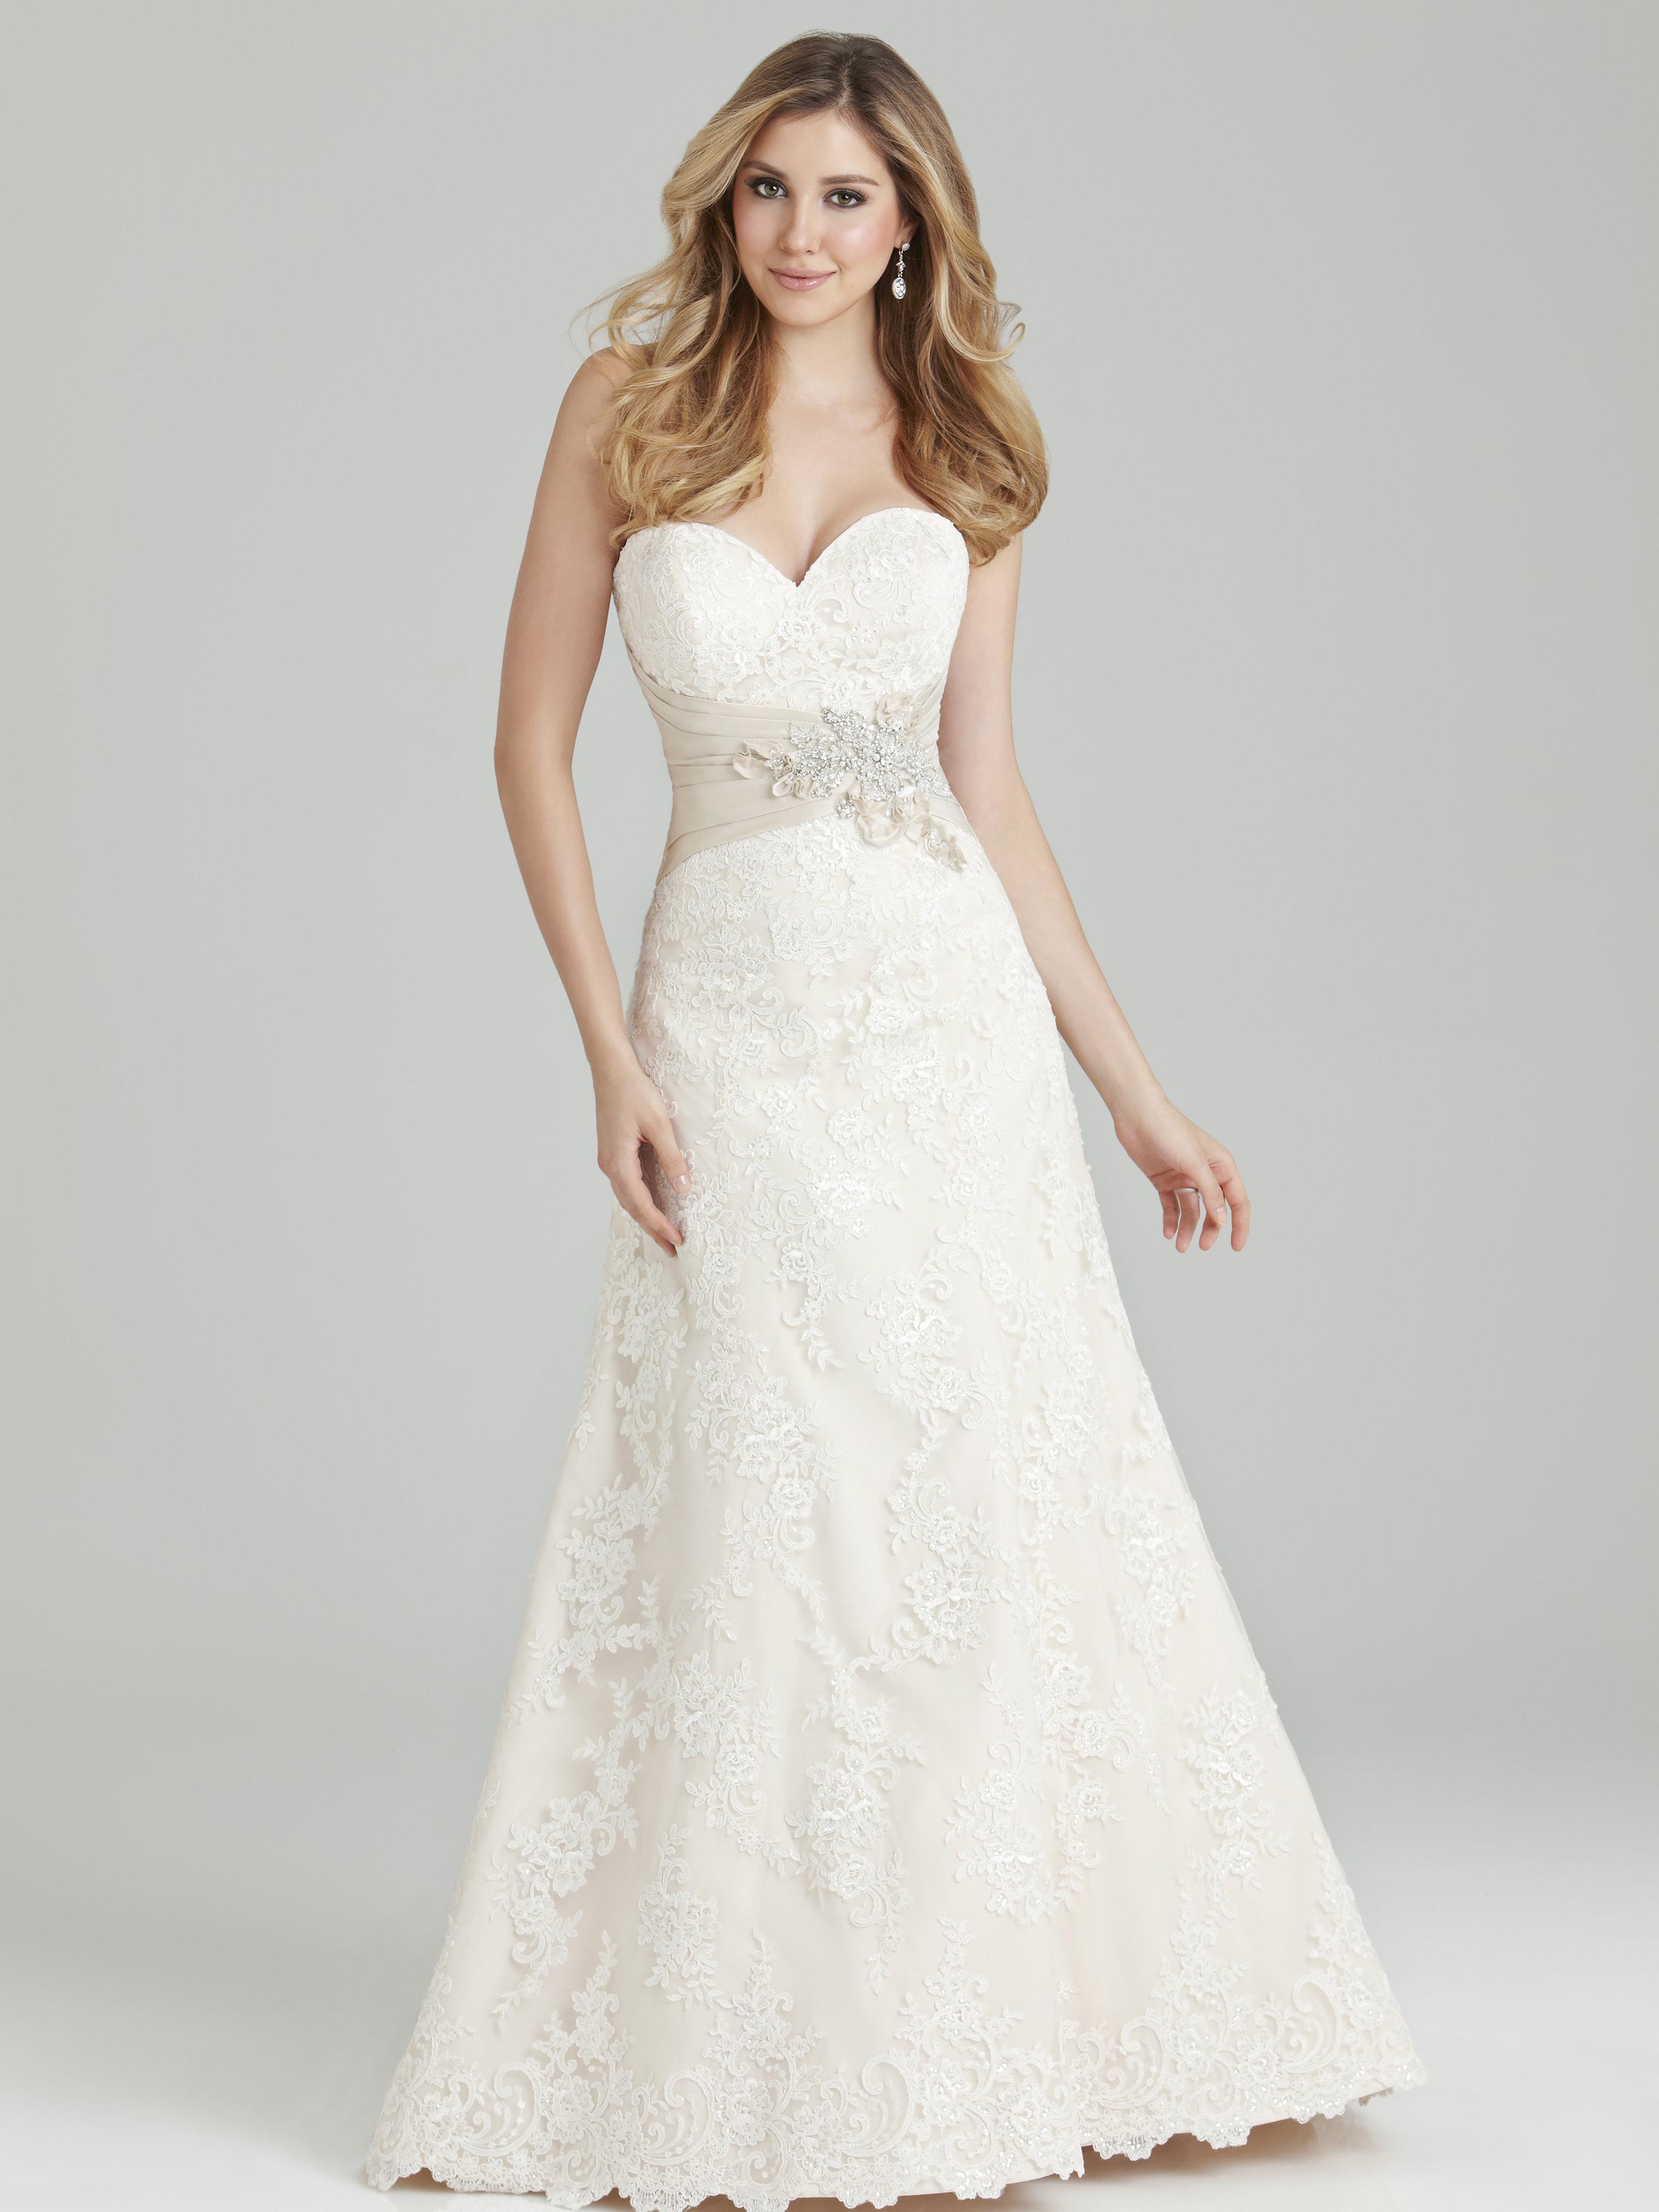 Marys Designer Bridal Boutique Allure Romance Wedding Gowns